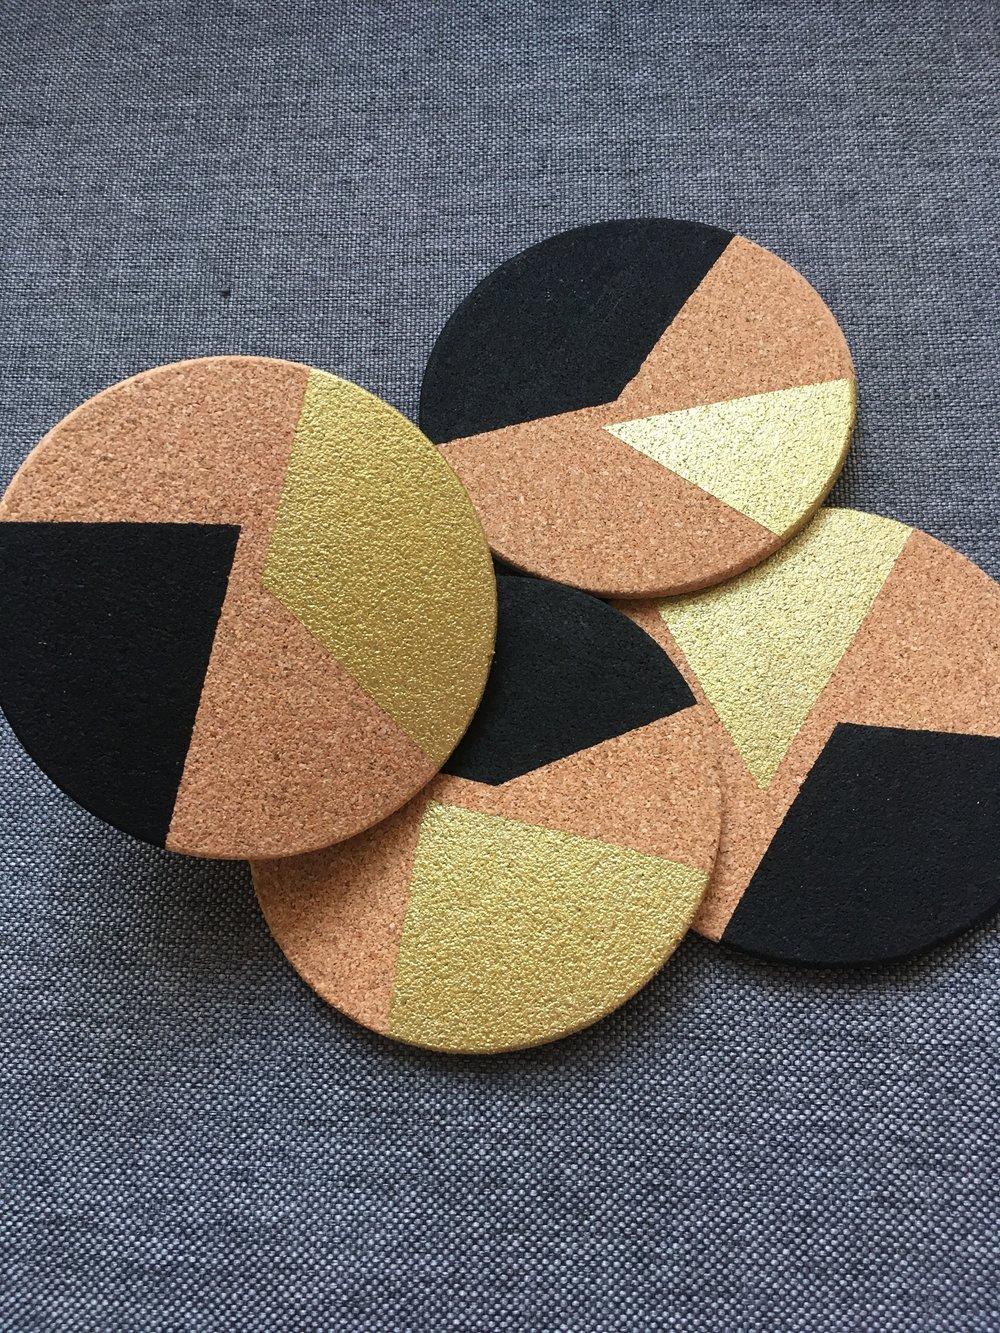 2-Color Block (Black & Gold)